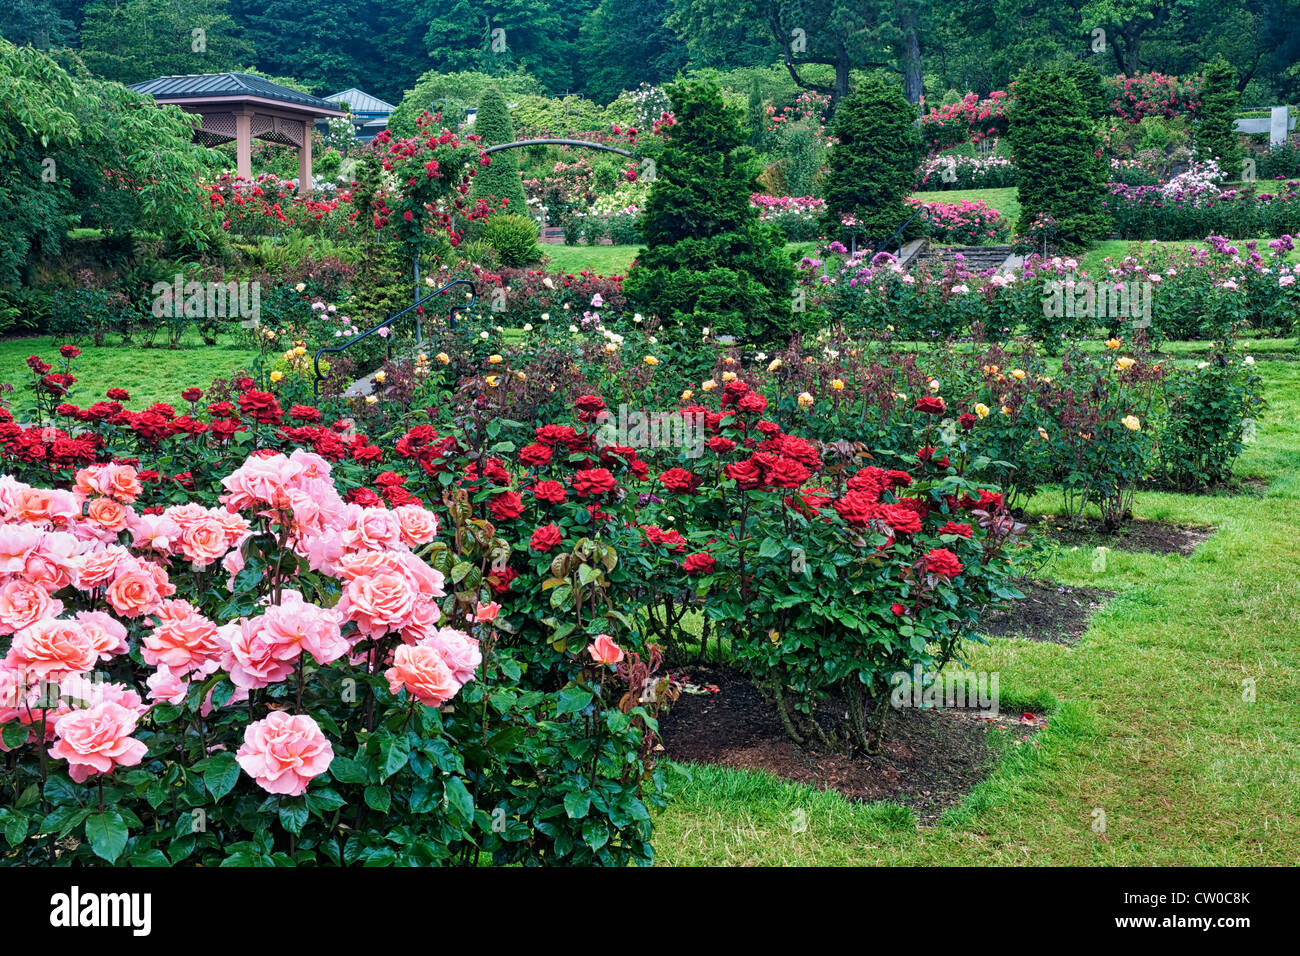 Portland s international rose test garden in washington - International rose test garden portland ...